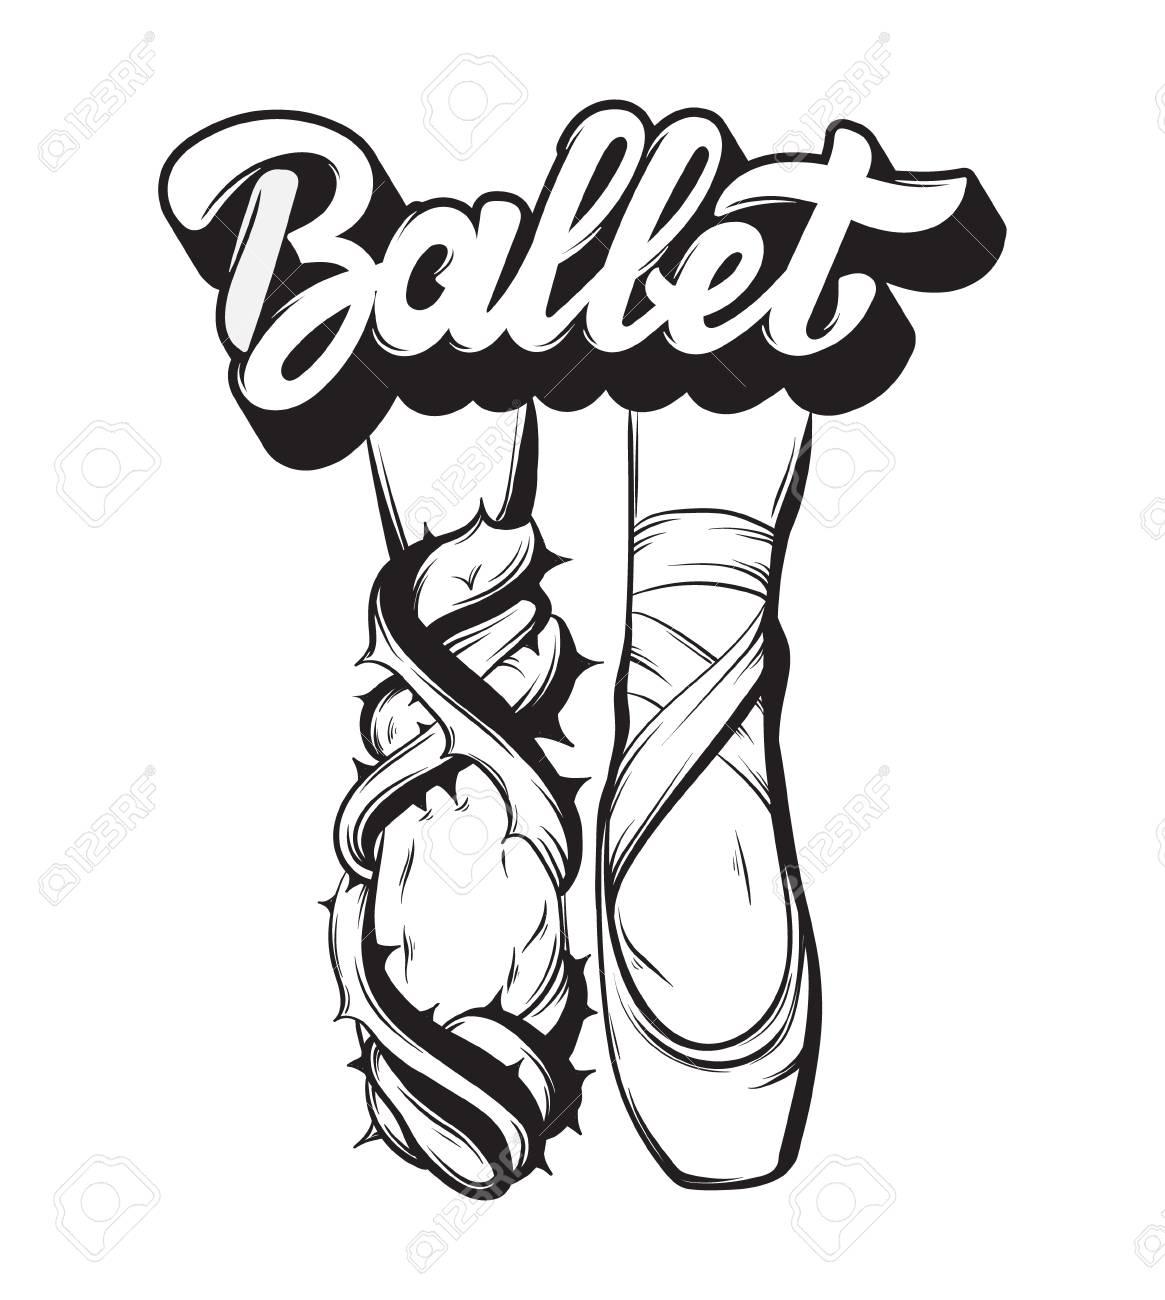 1165x1300 Ballet. Vector Handwritten Lettering With Hand Drawn Creative